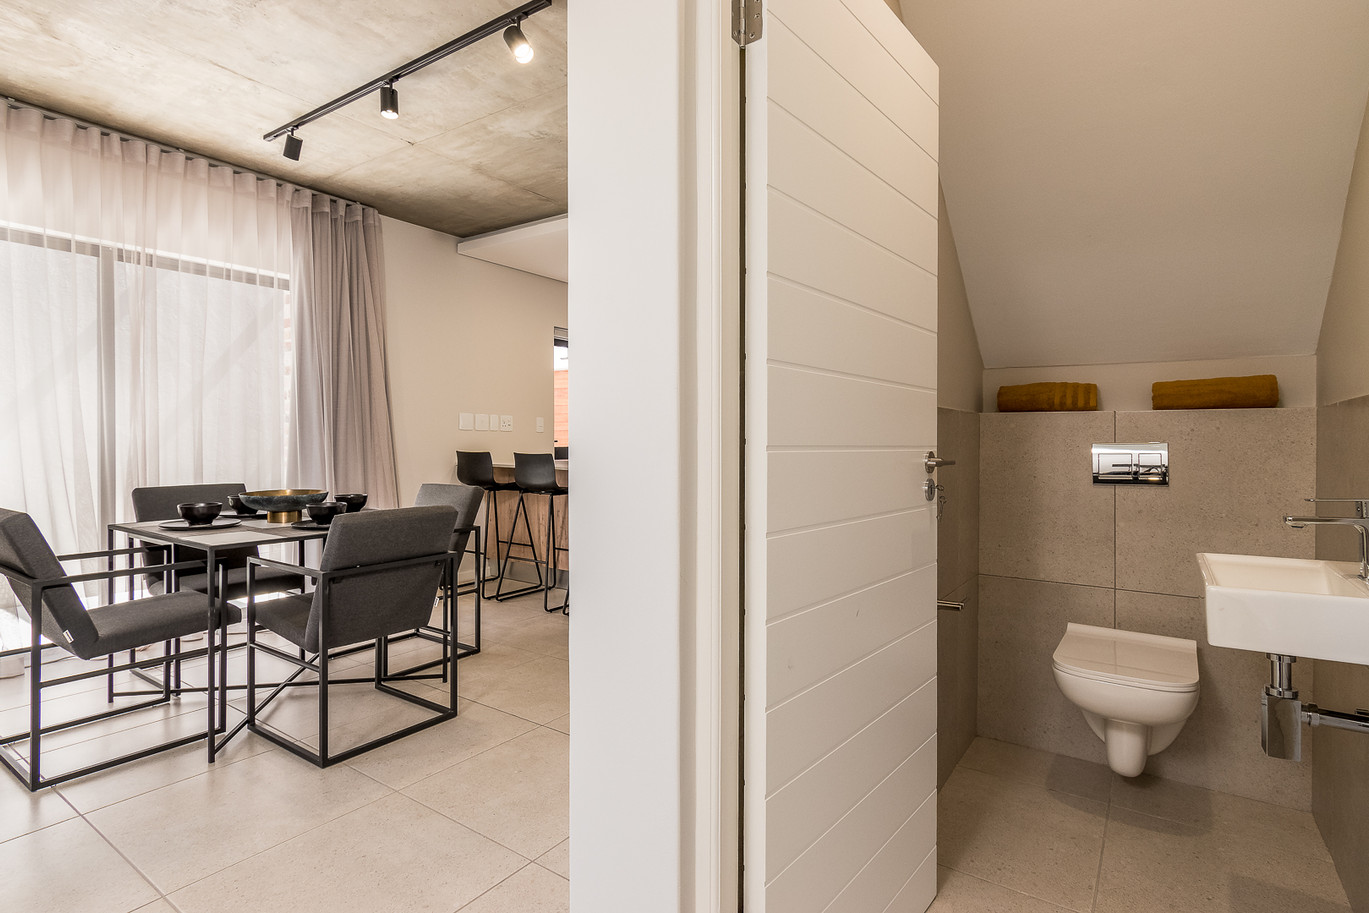 Greystone - Guest Toilet